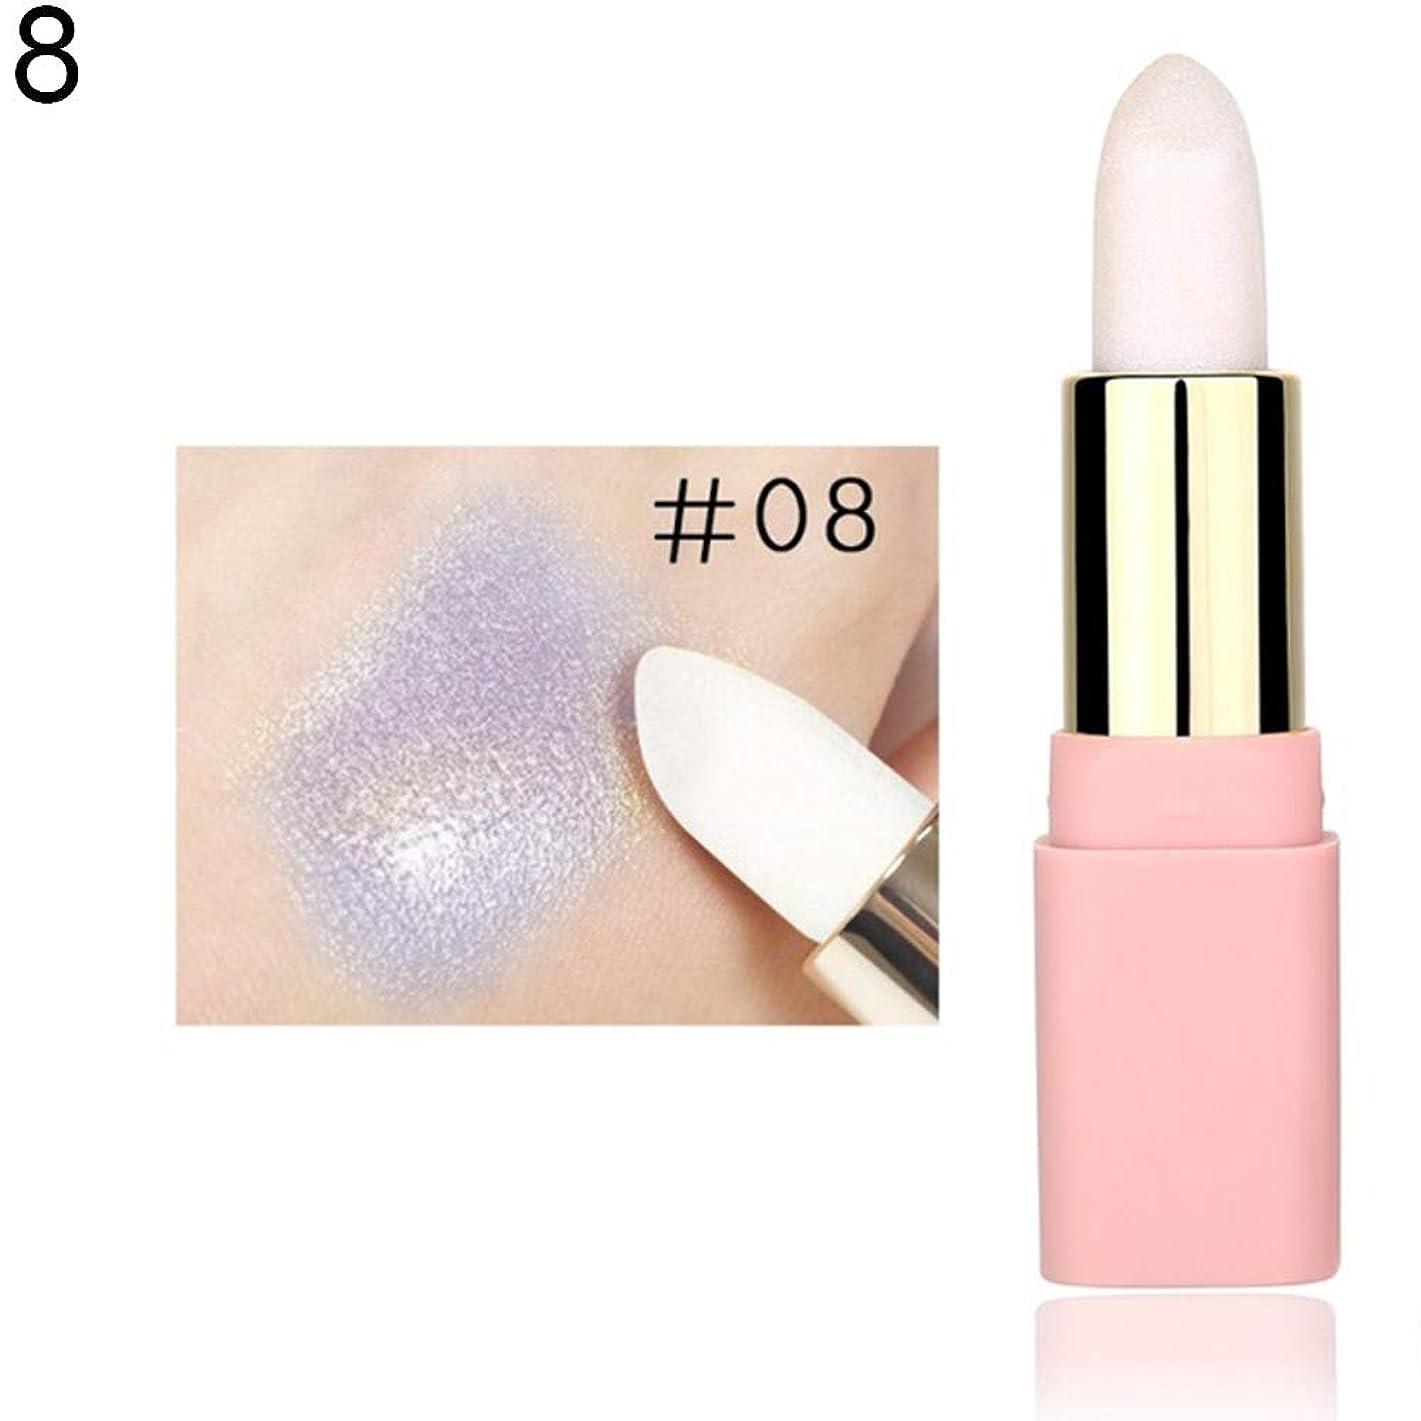 wewa98698 LULAA Glitter Pearl Lip Cream Lipstick Long Lasting Natural Moisturizer Makeup - 8#